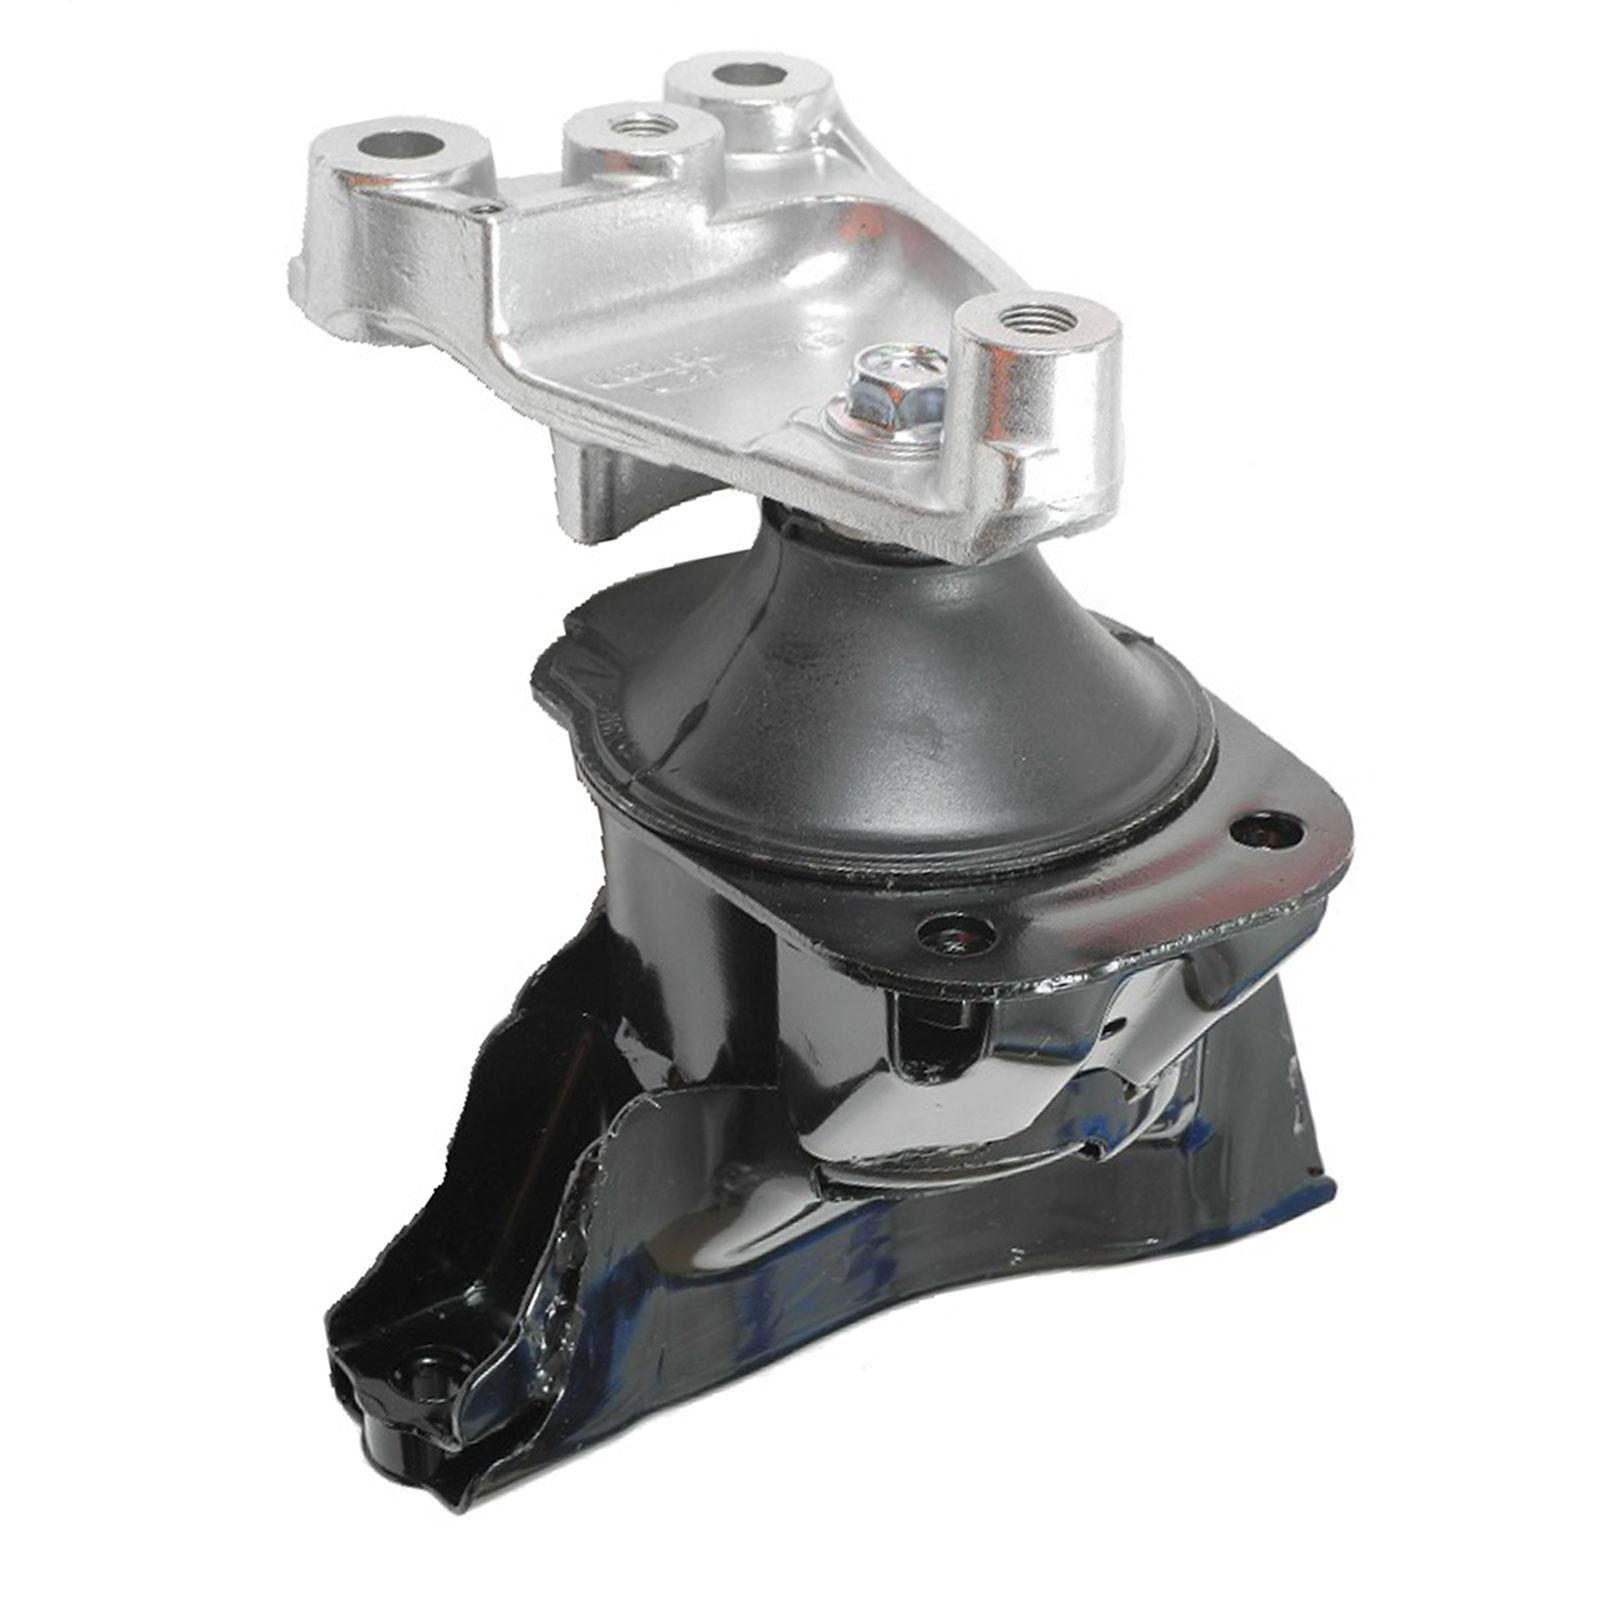 For Honda Civic LX Coupe FWD 1.8L Engine Motor /& Transmission Mount Set 3PCS